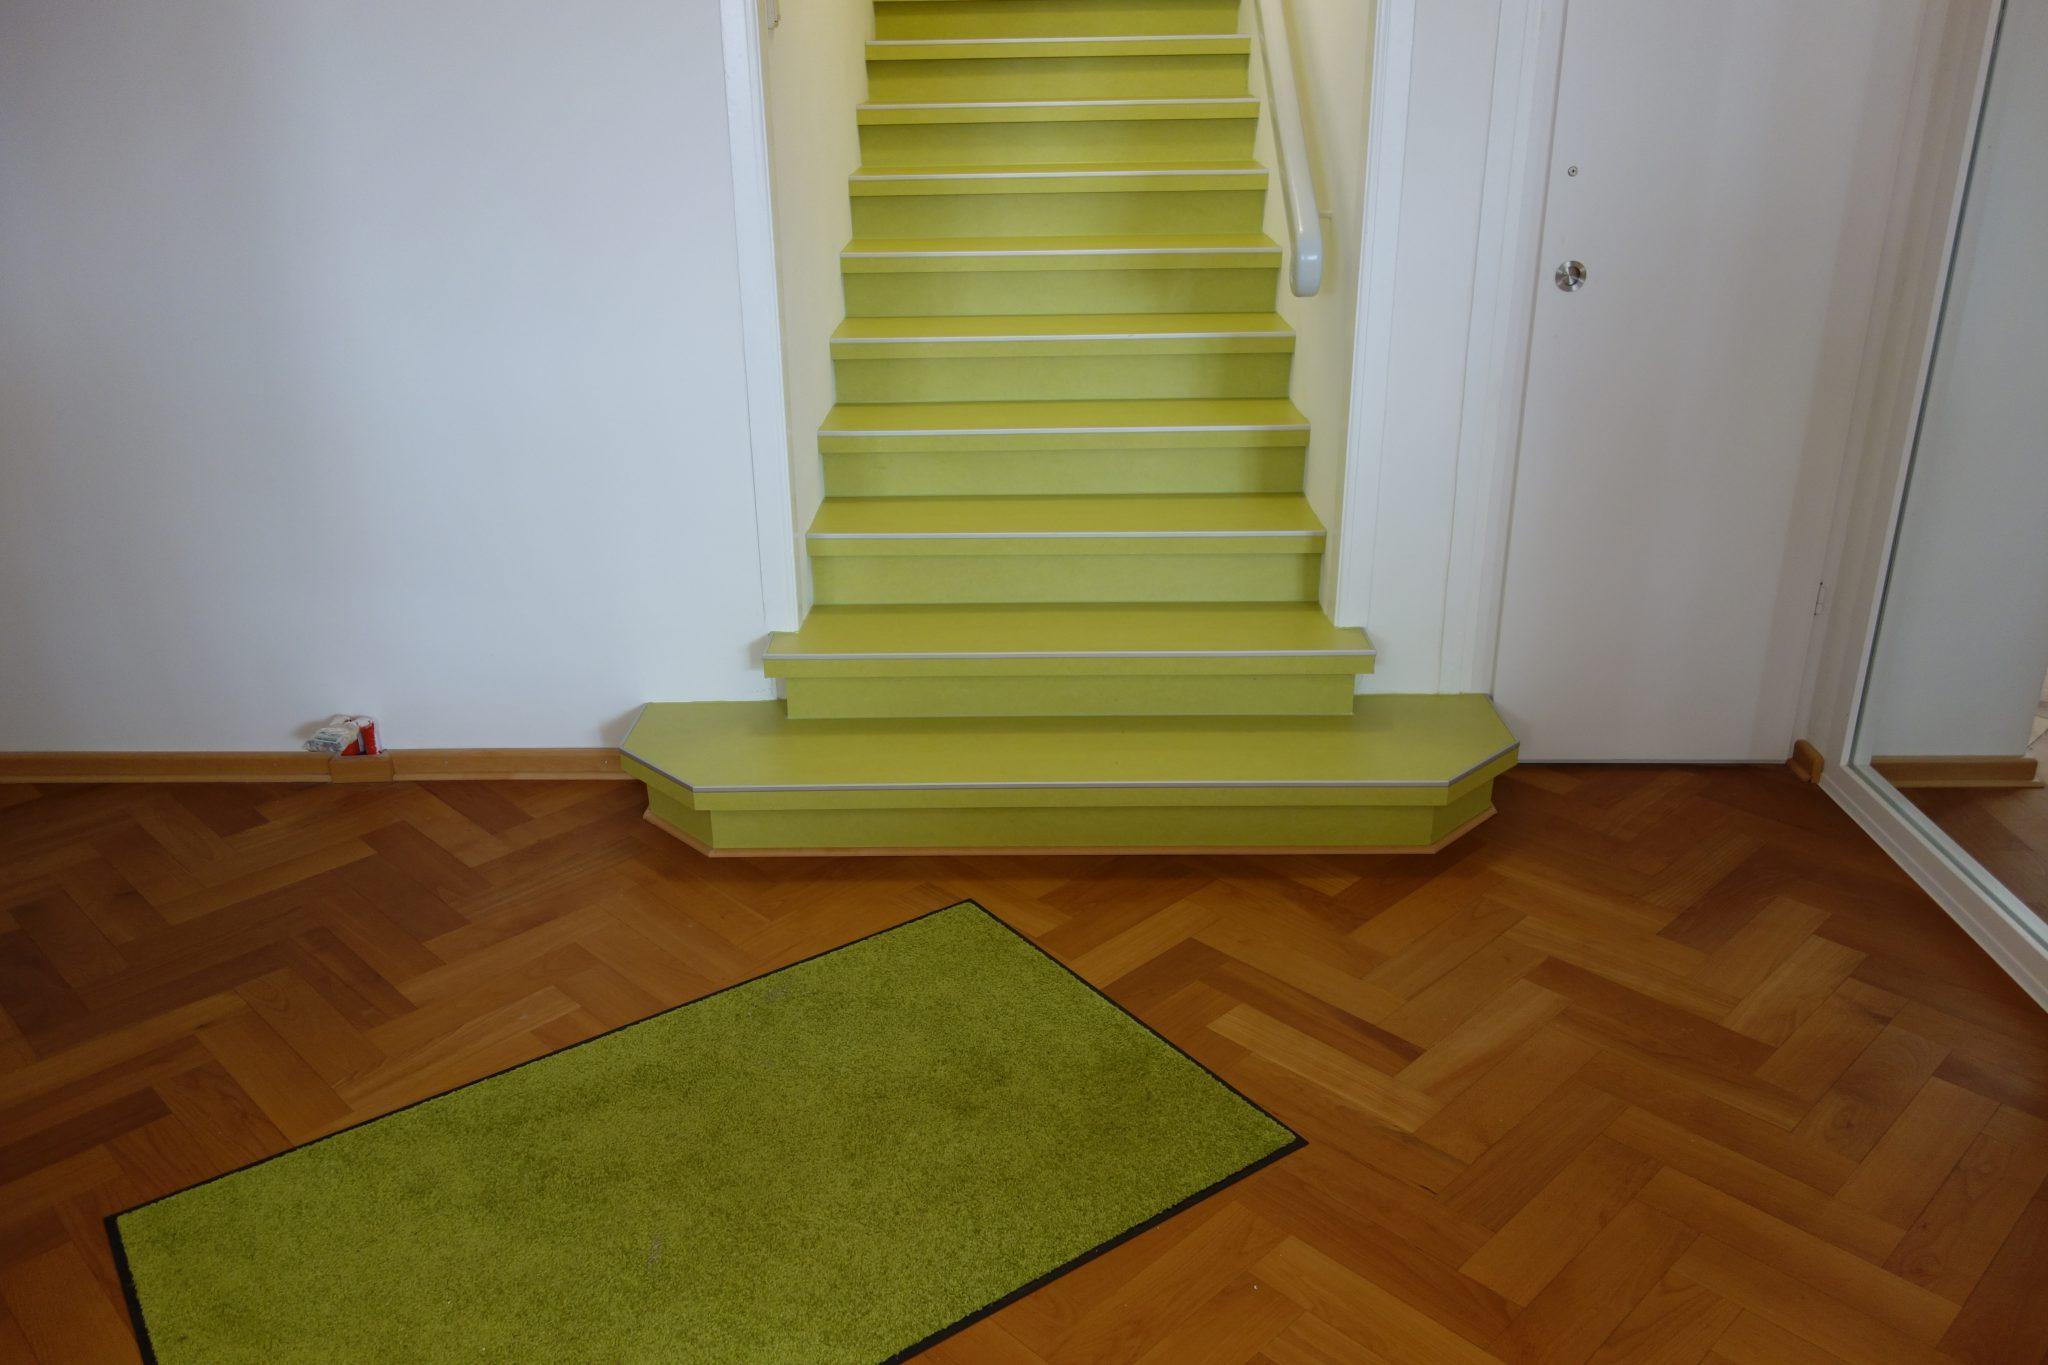 Projekt: Architekturbüro in Stadt Villa umgezogen (Suhl)